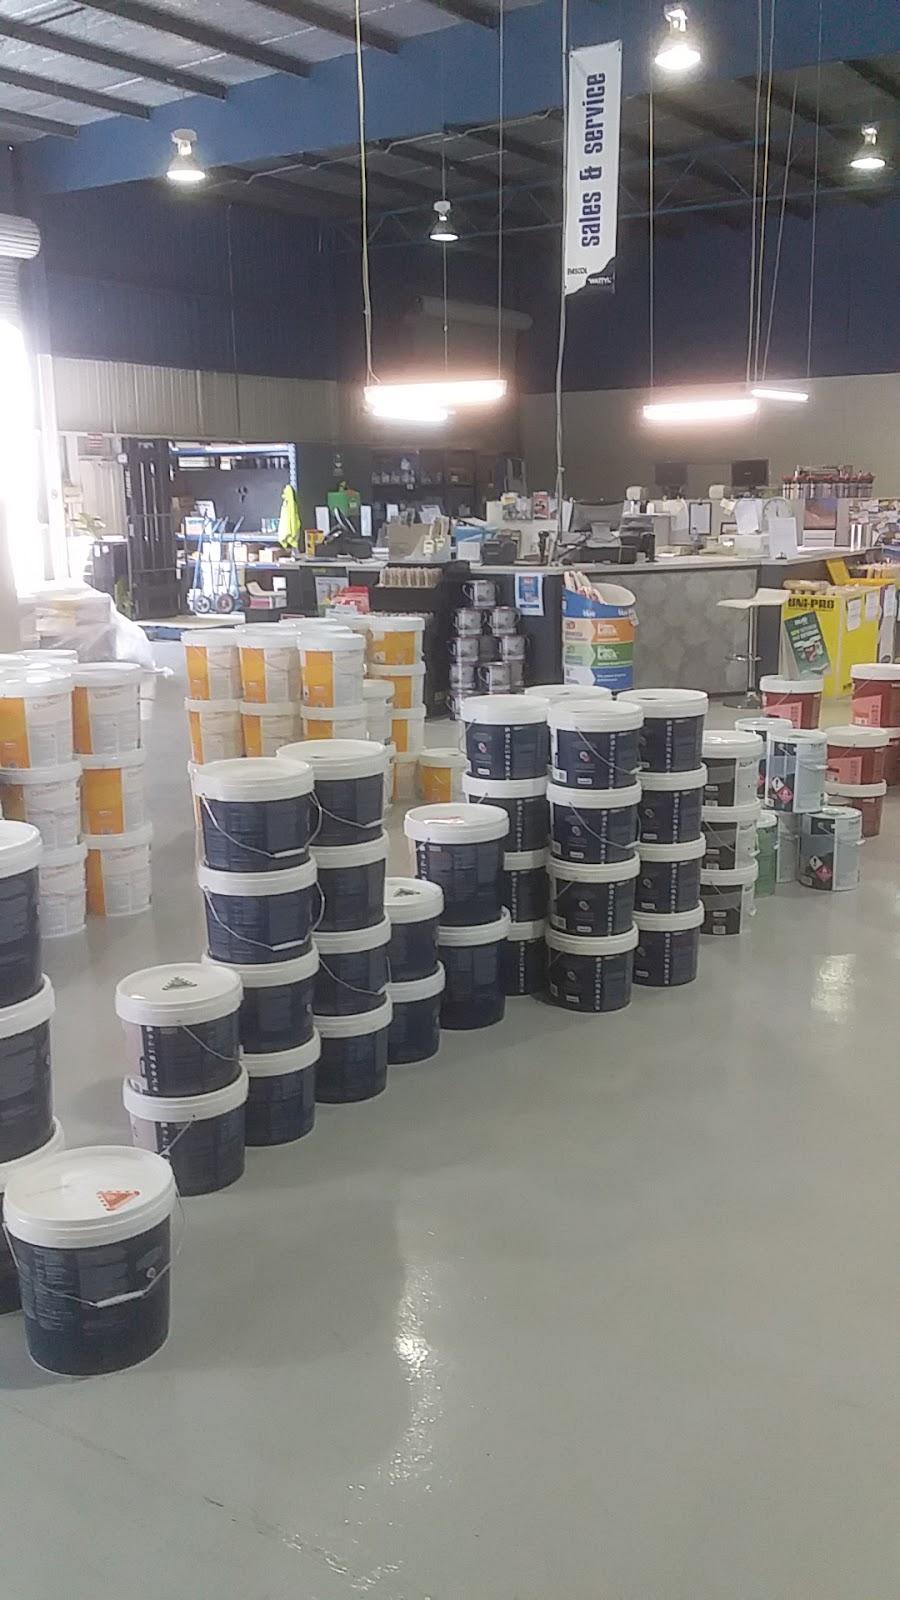 Wattyl Paint Centre Wagga Wagga | home goods store | 180 Forsyth St, Wagga Wagga NSW 2650, Australia | 0269214381 OR +61 2 6921 4381